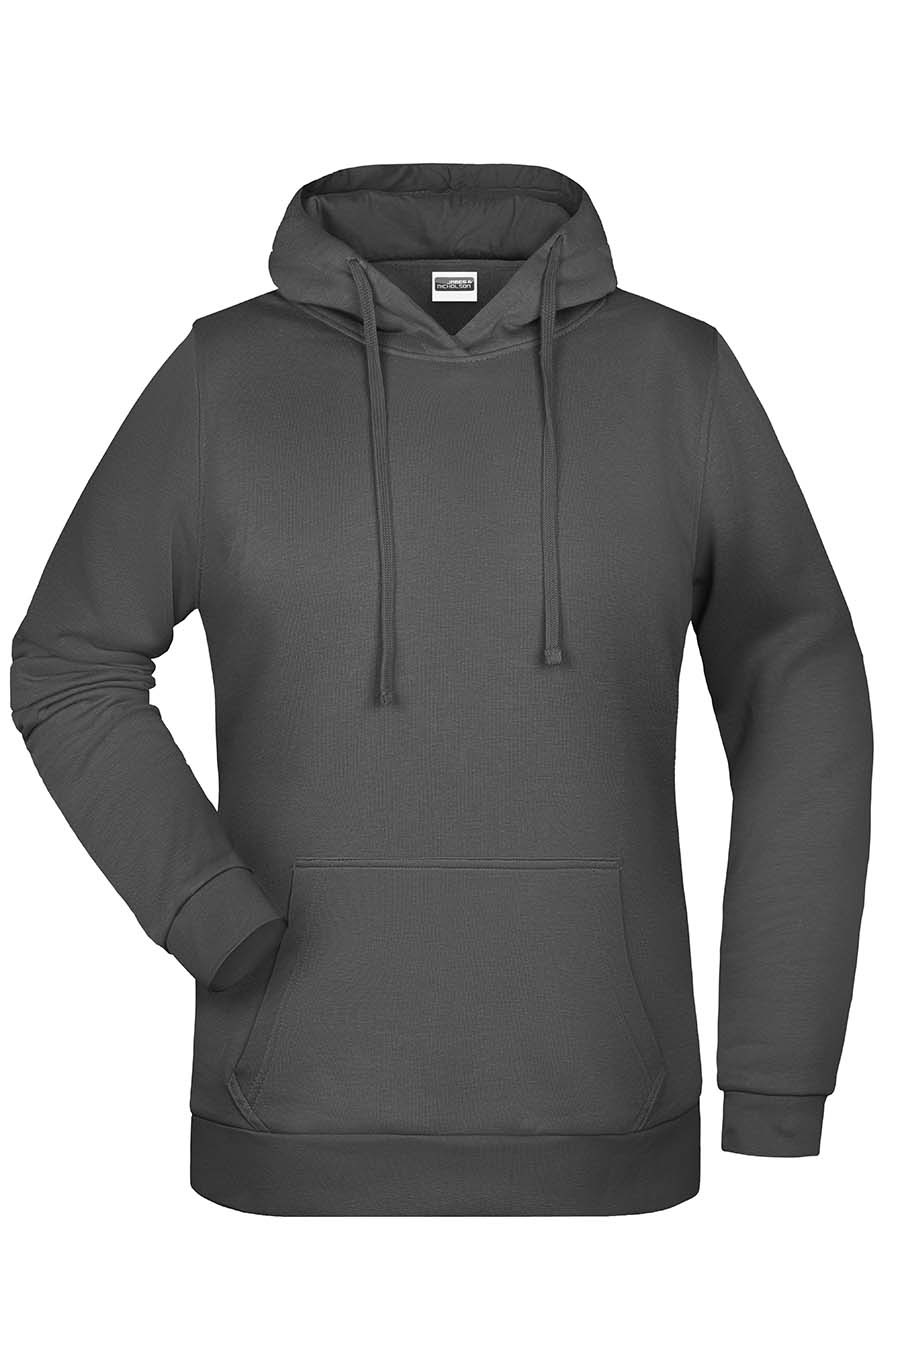 Sweat-shirt capuche femme - 20-1494-7